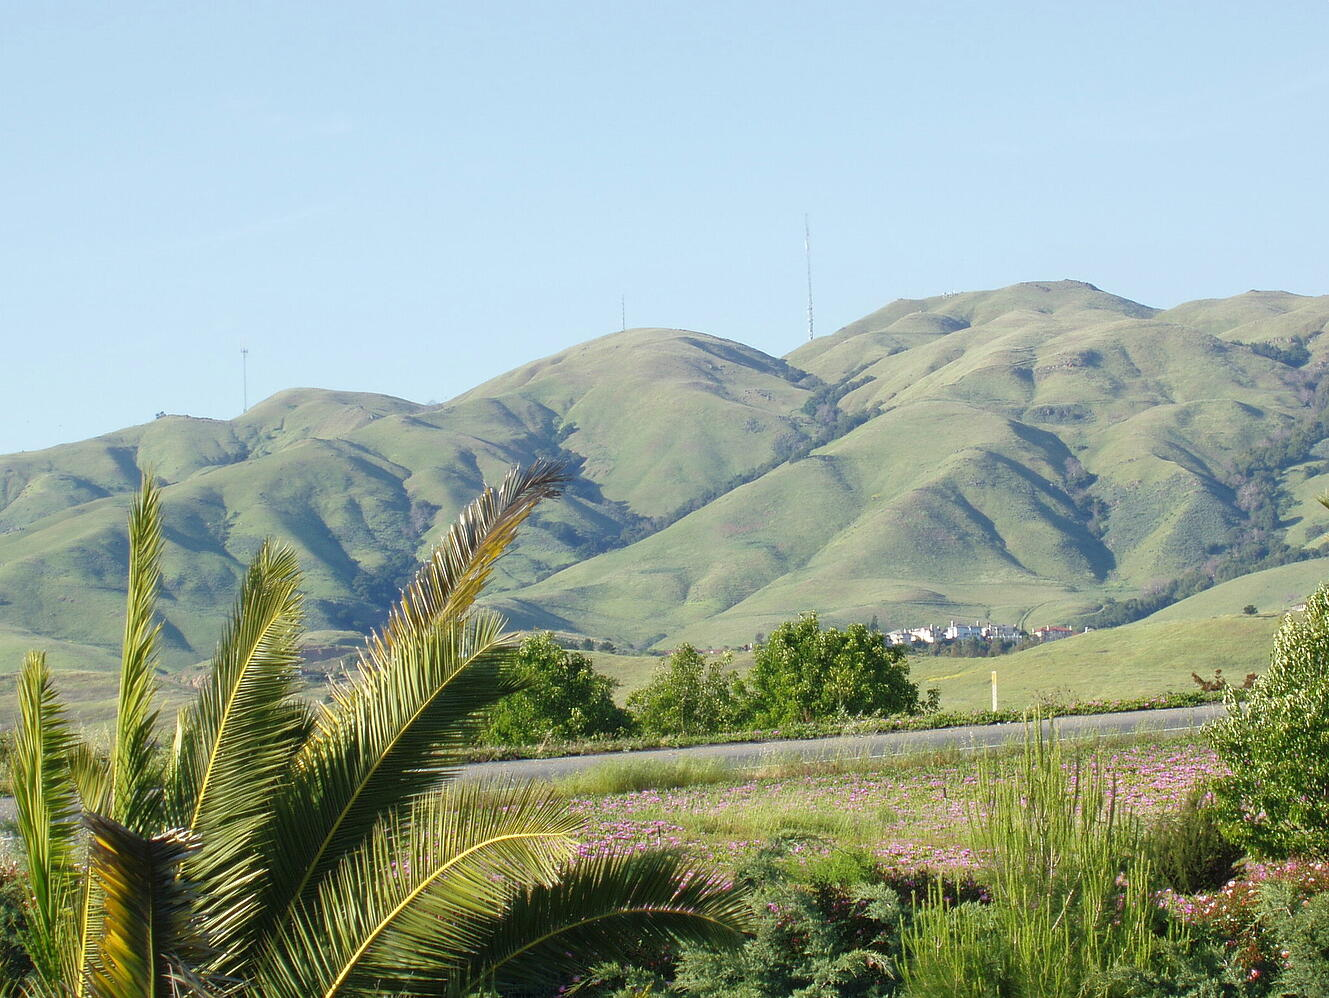 Home Security Systems Milpitas Santa Clara County California